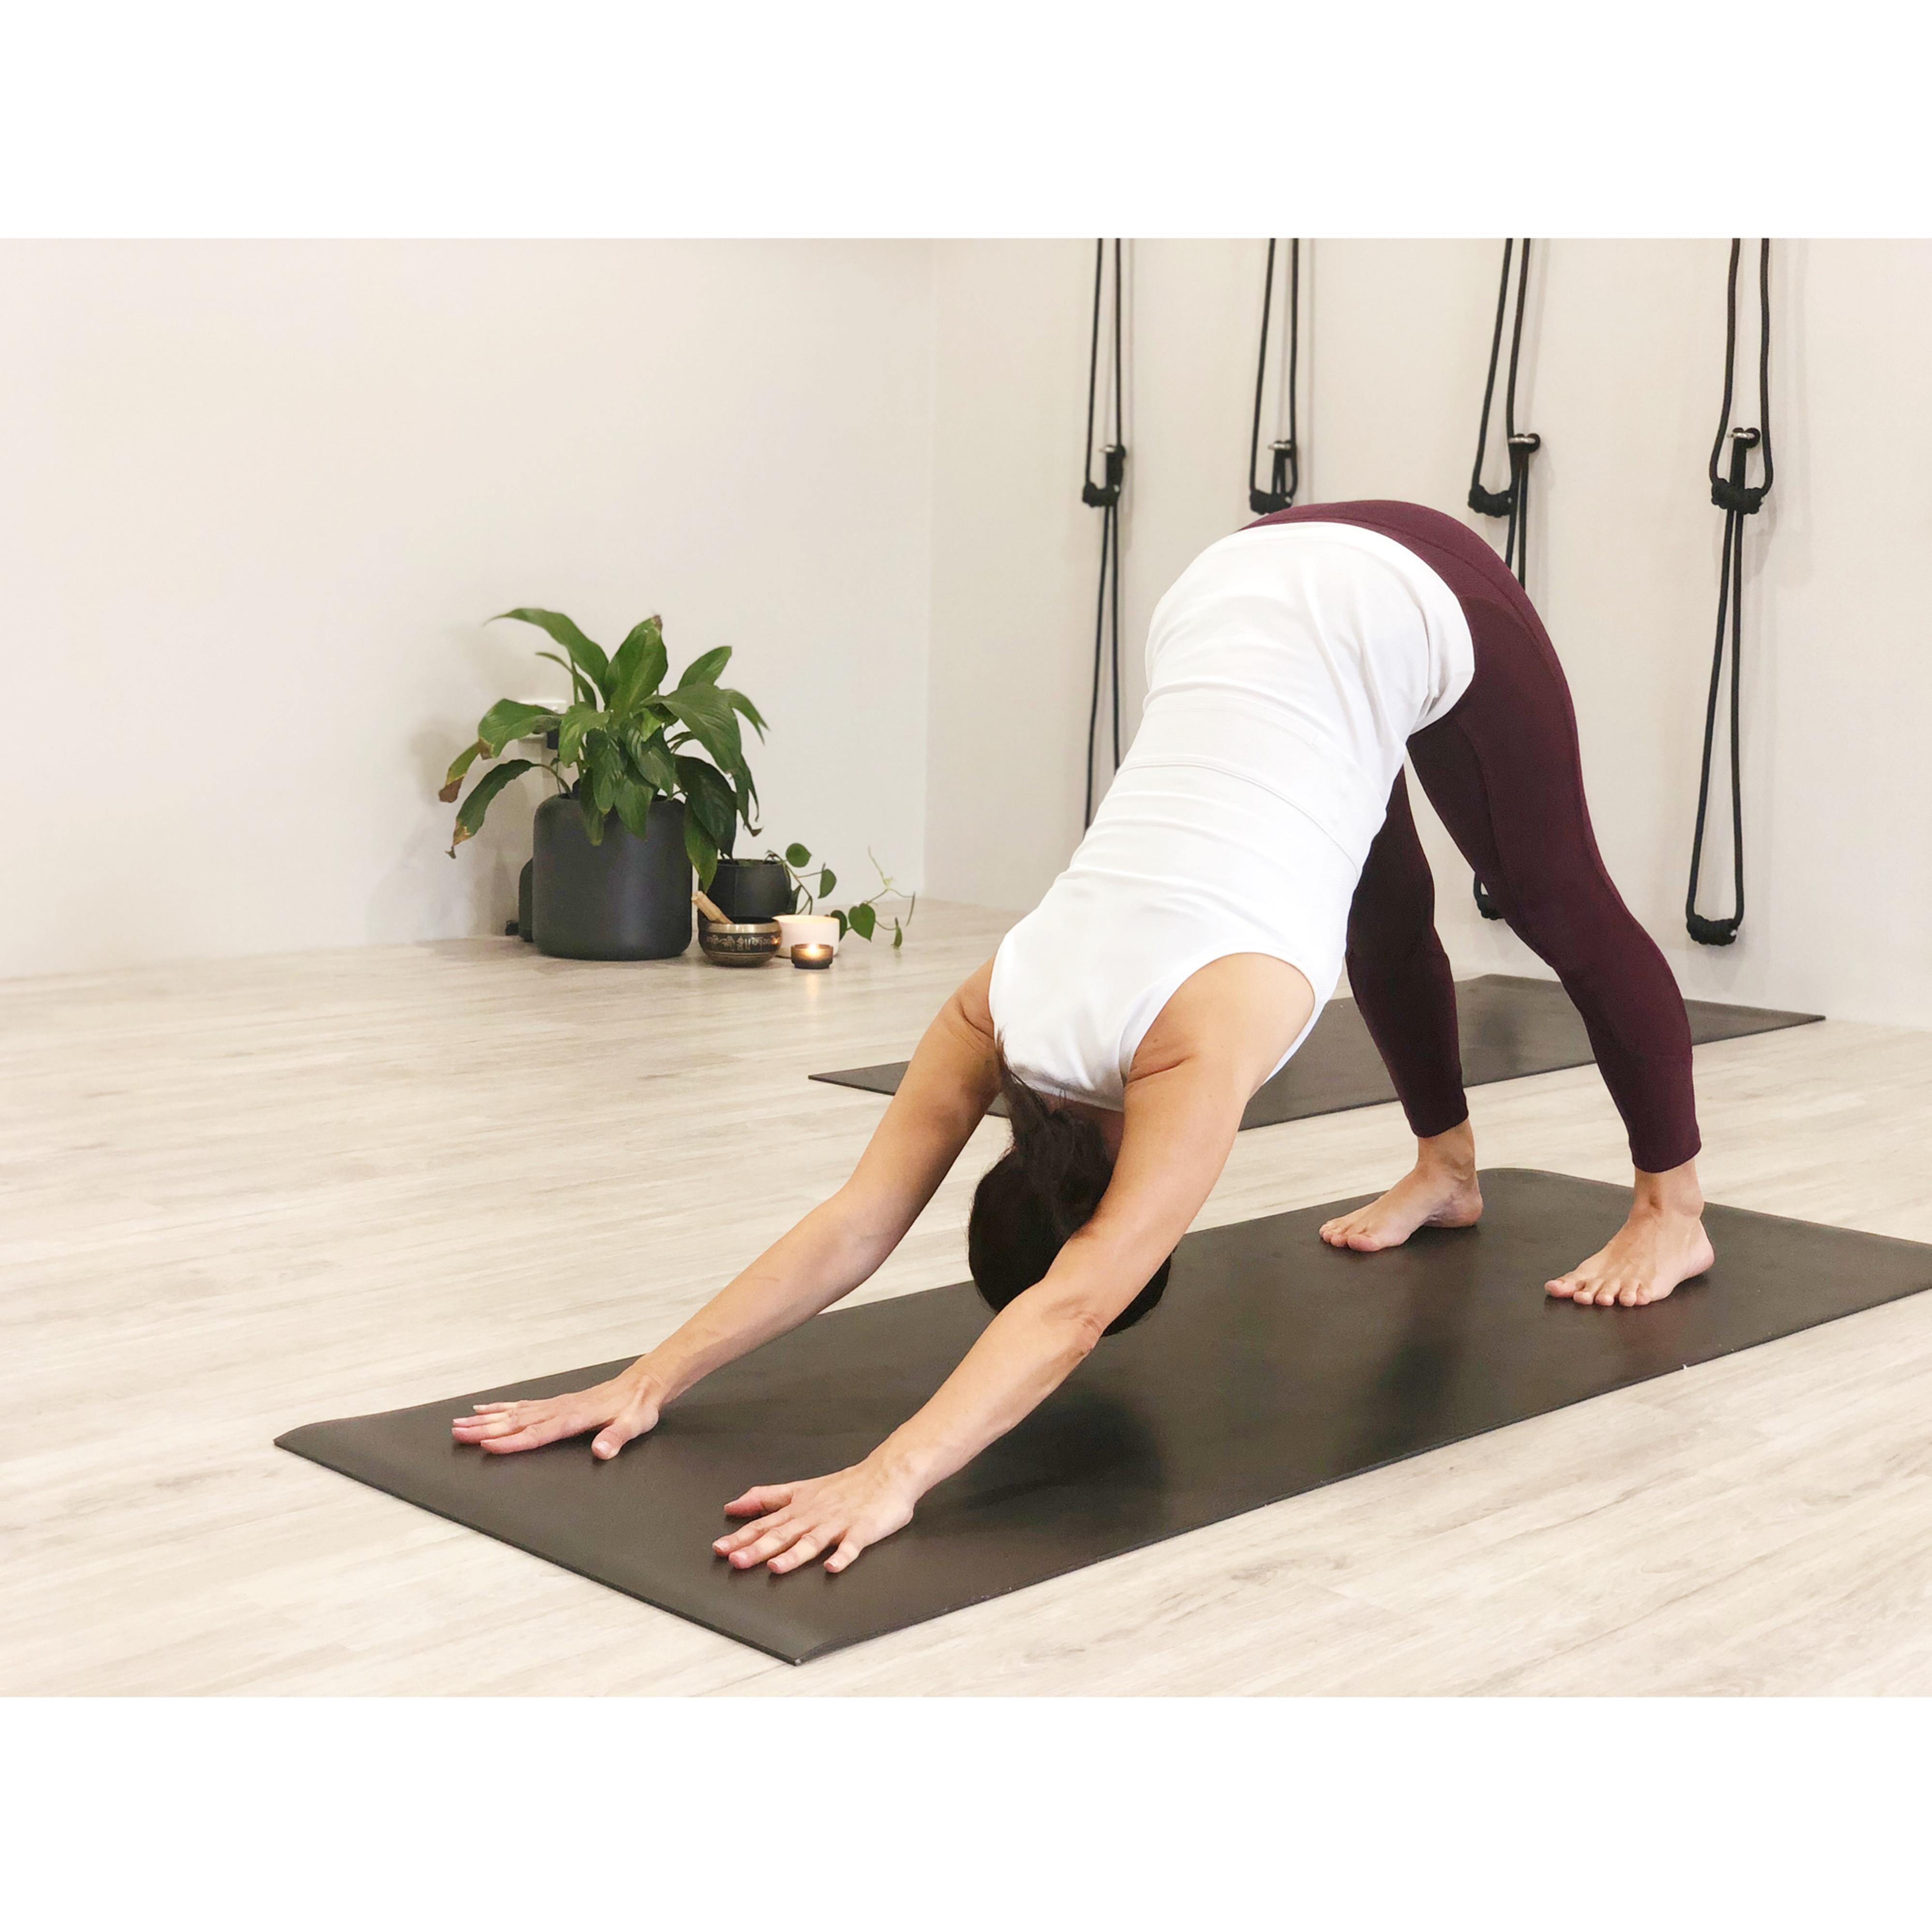 General Yoga  * All levels